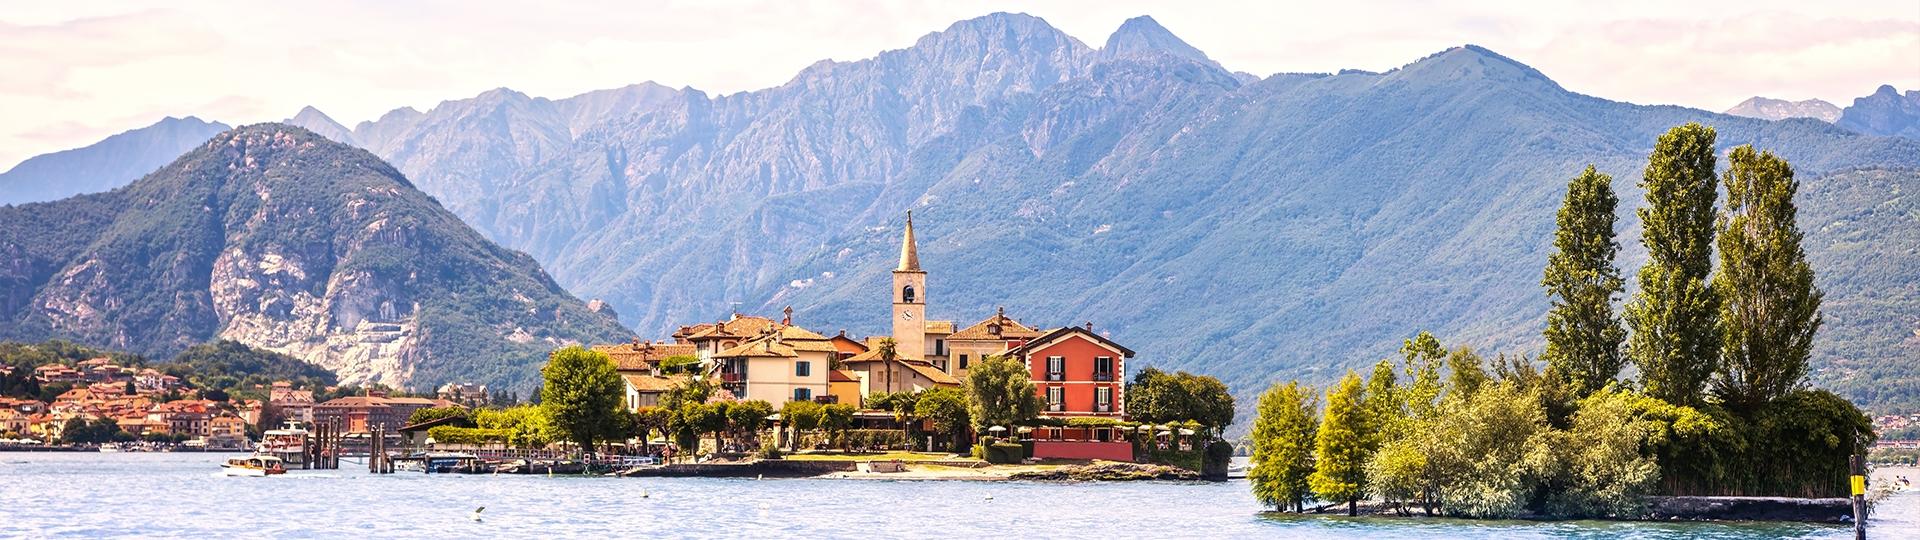 English To Italian Translator Google: Italian Indulgence By Back-Roads Touring With 2 Tour